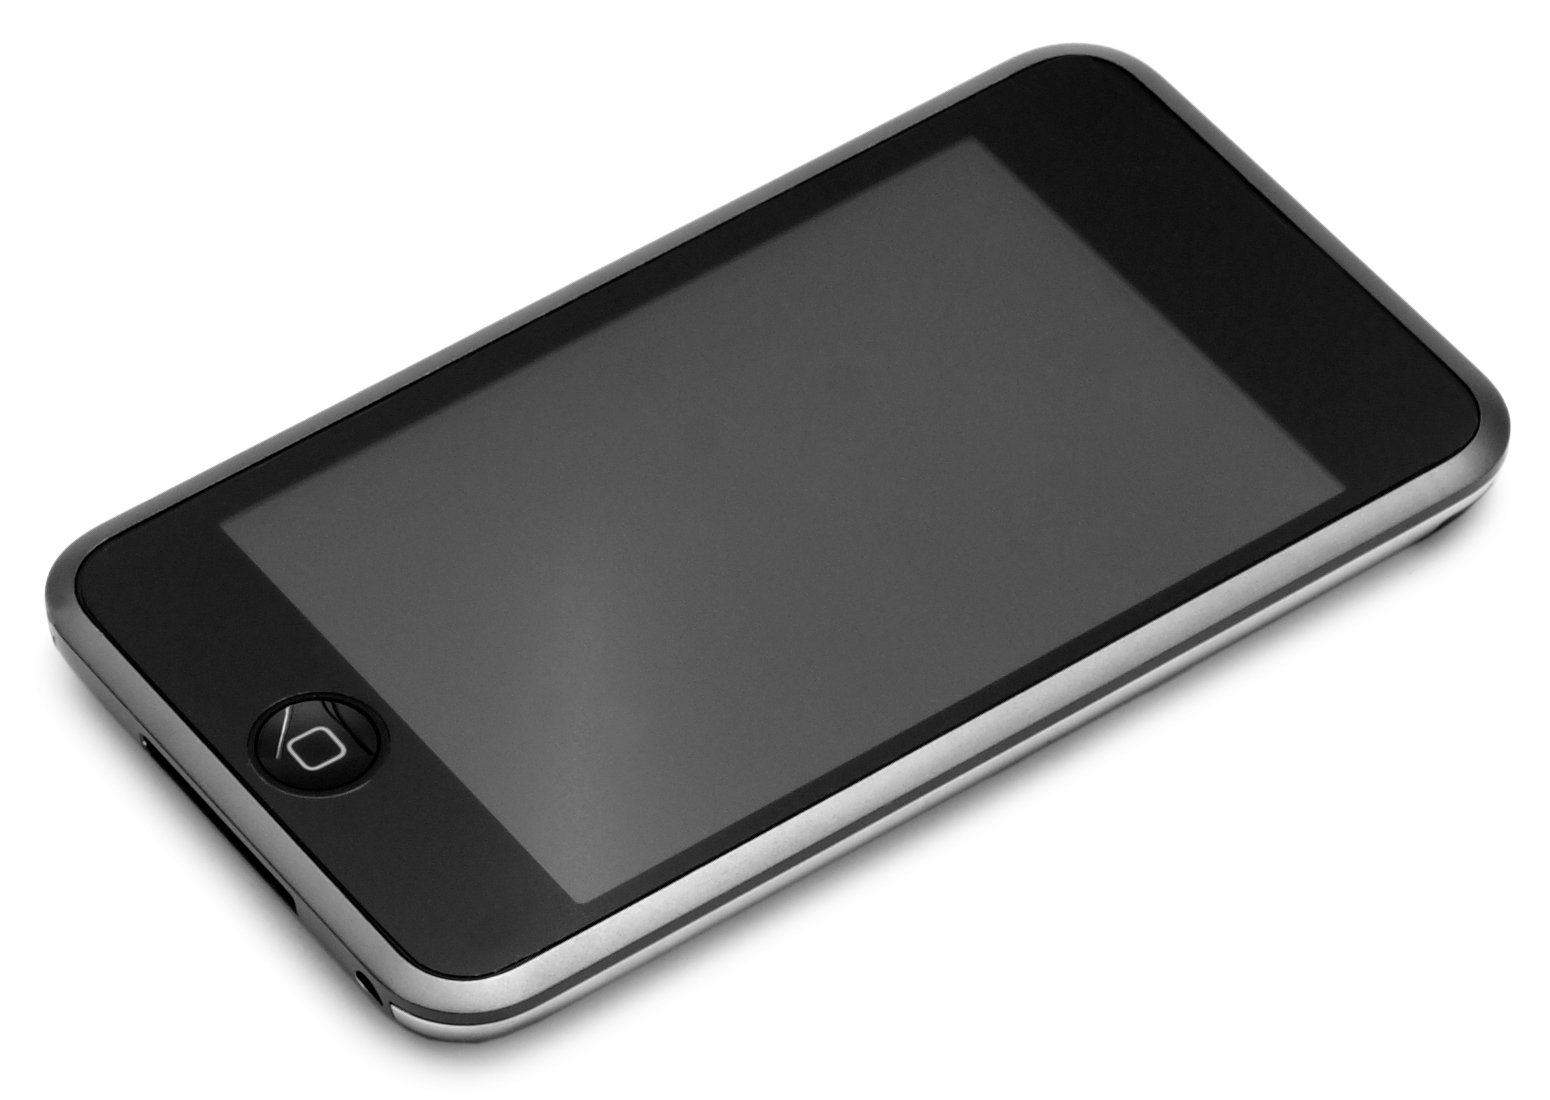 ipod touch 1 gen latest firmware